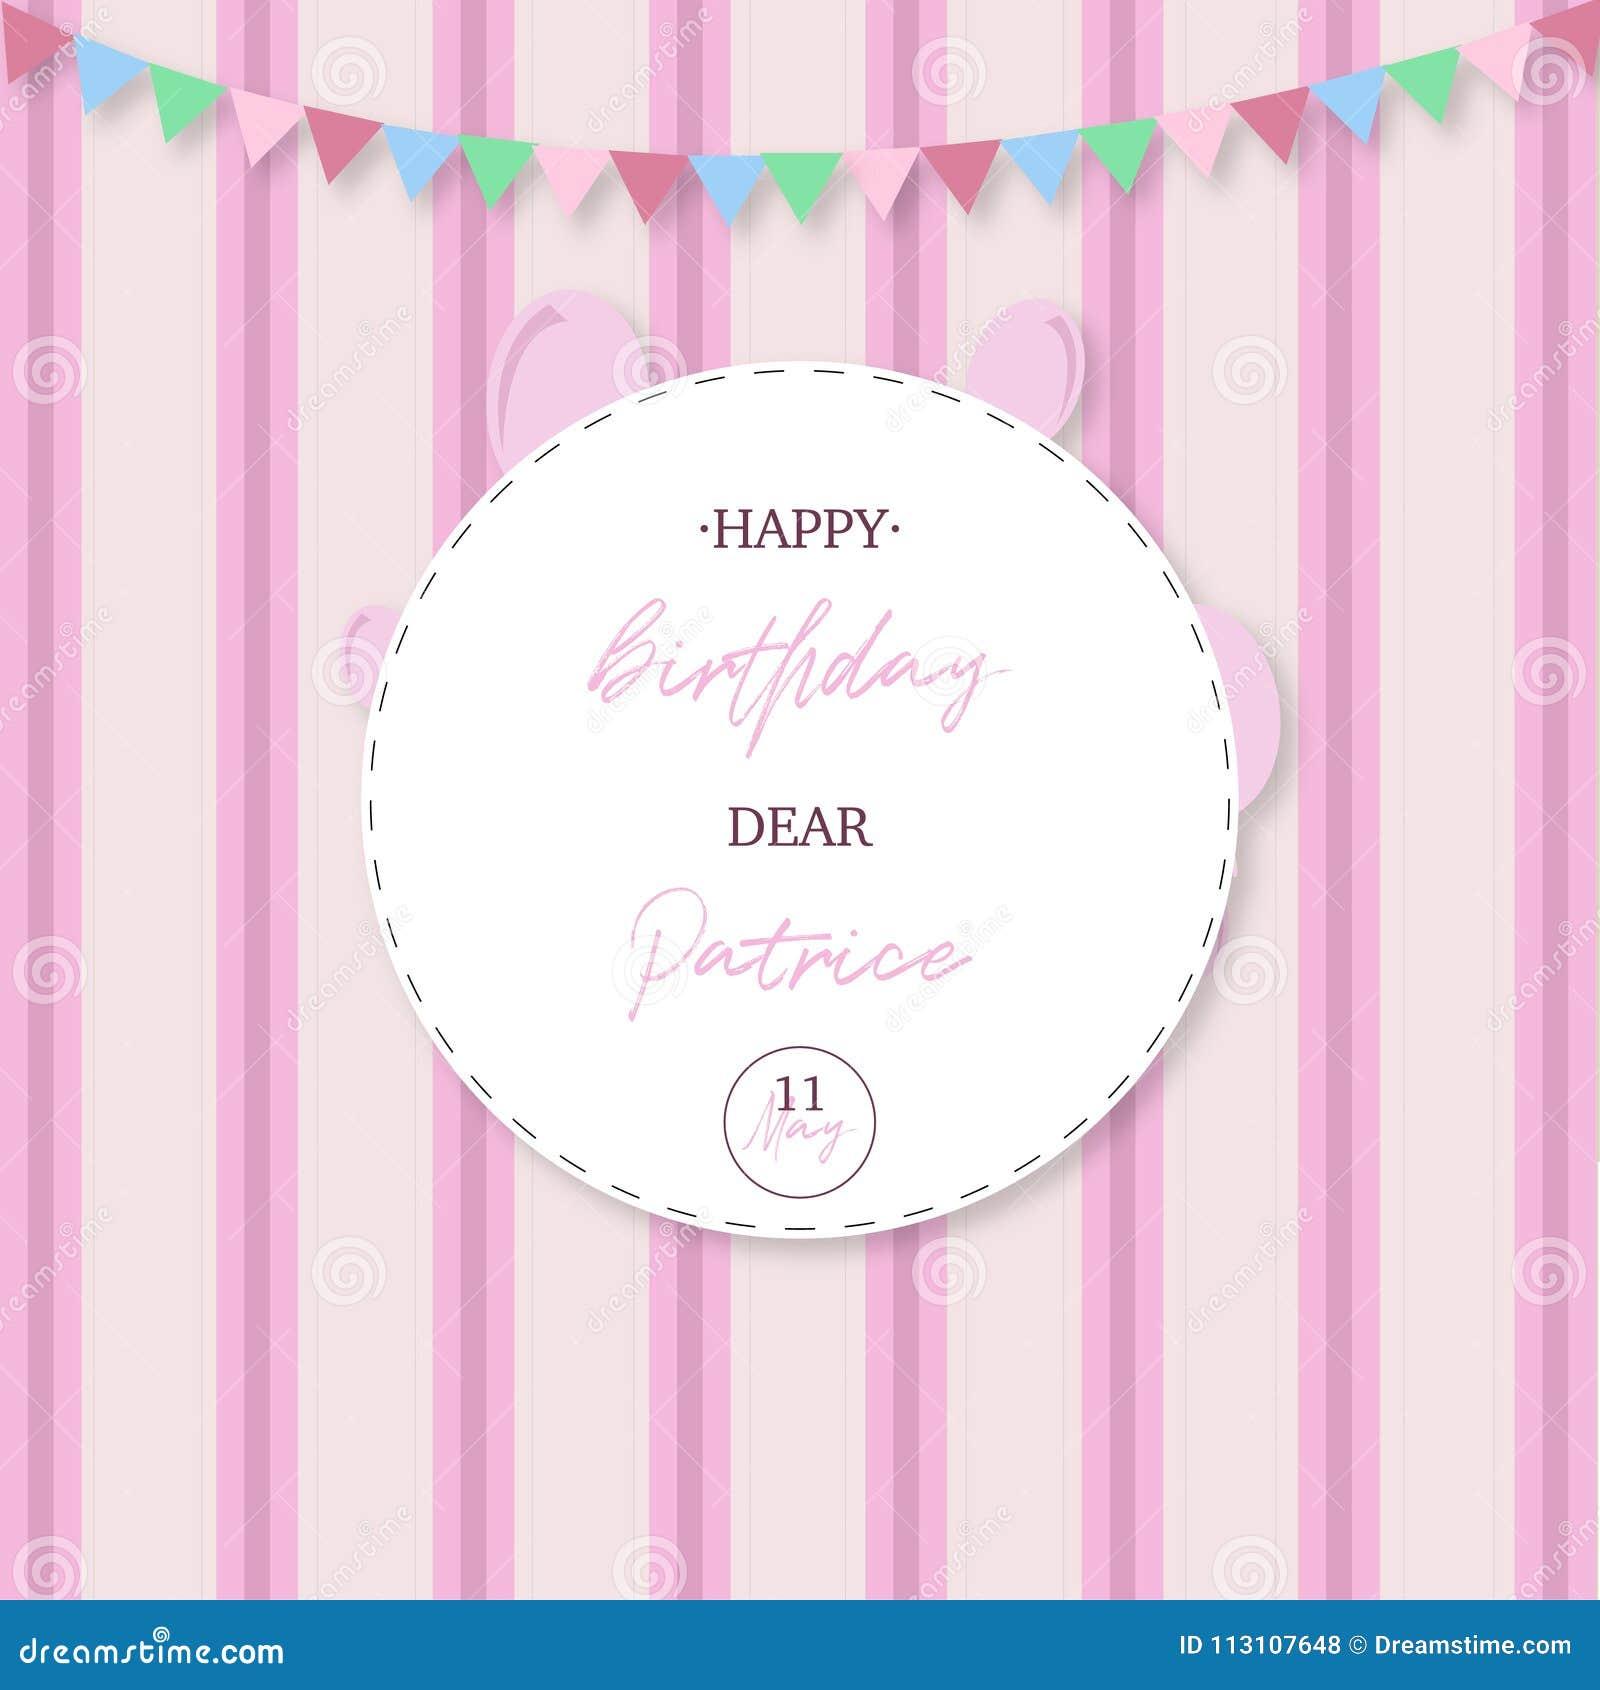 cute happy birthday invitation to dear friend